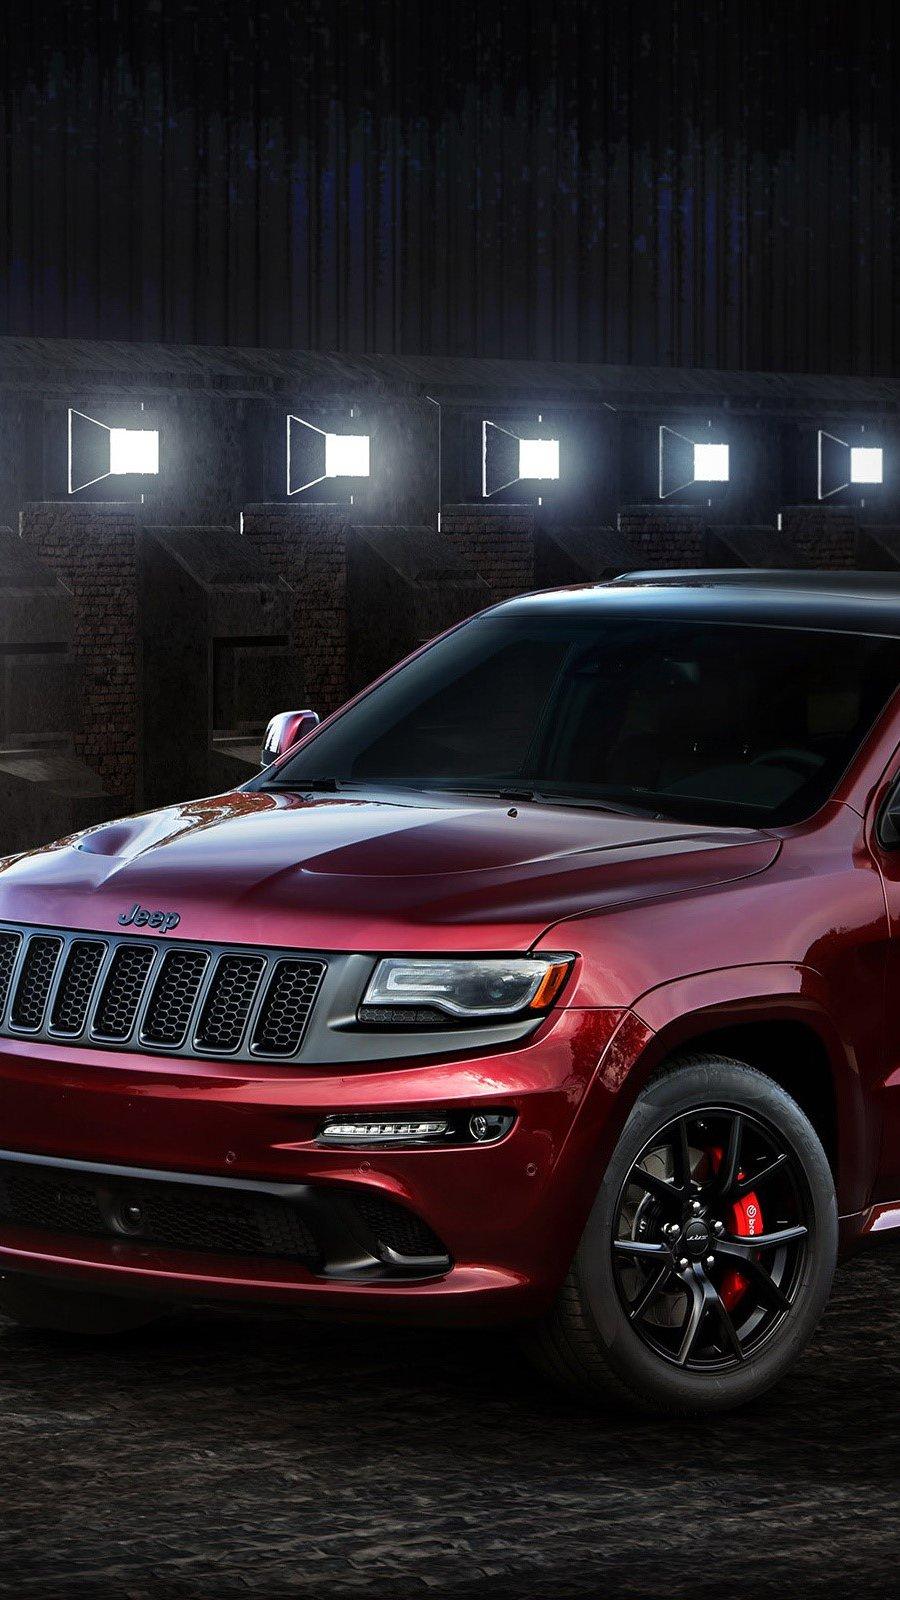 Fondos de pantalla Jeep Grand Cherokee SRT Vertical